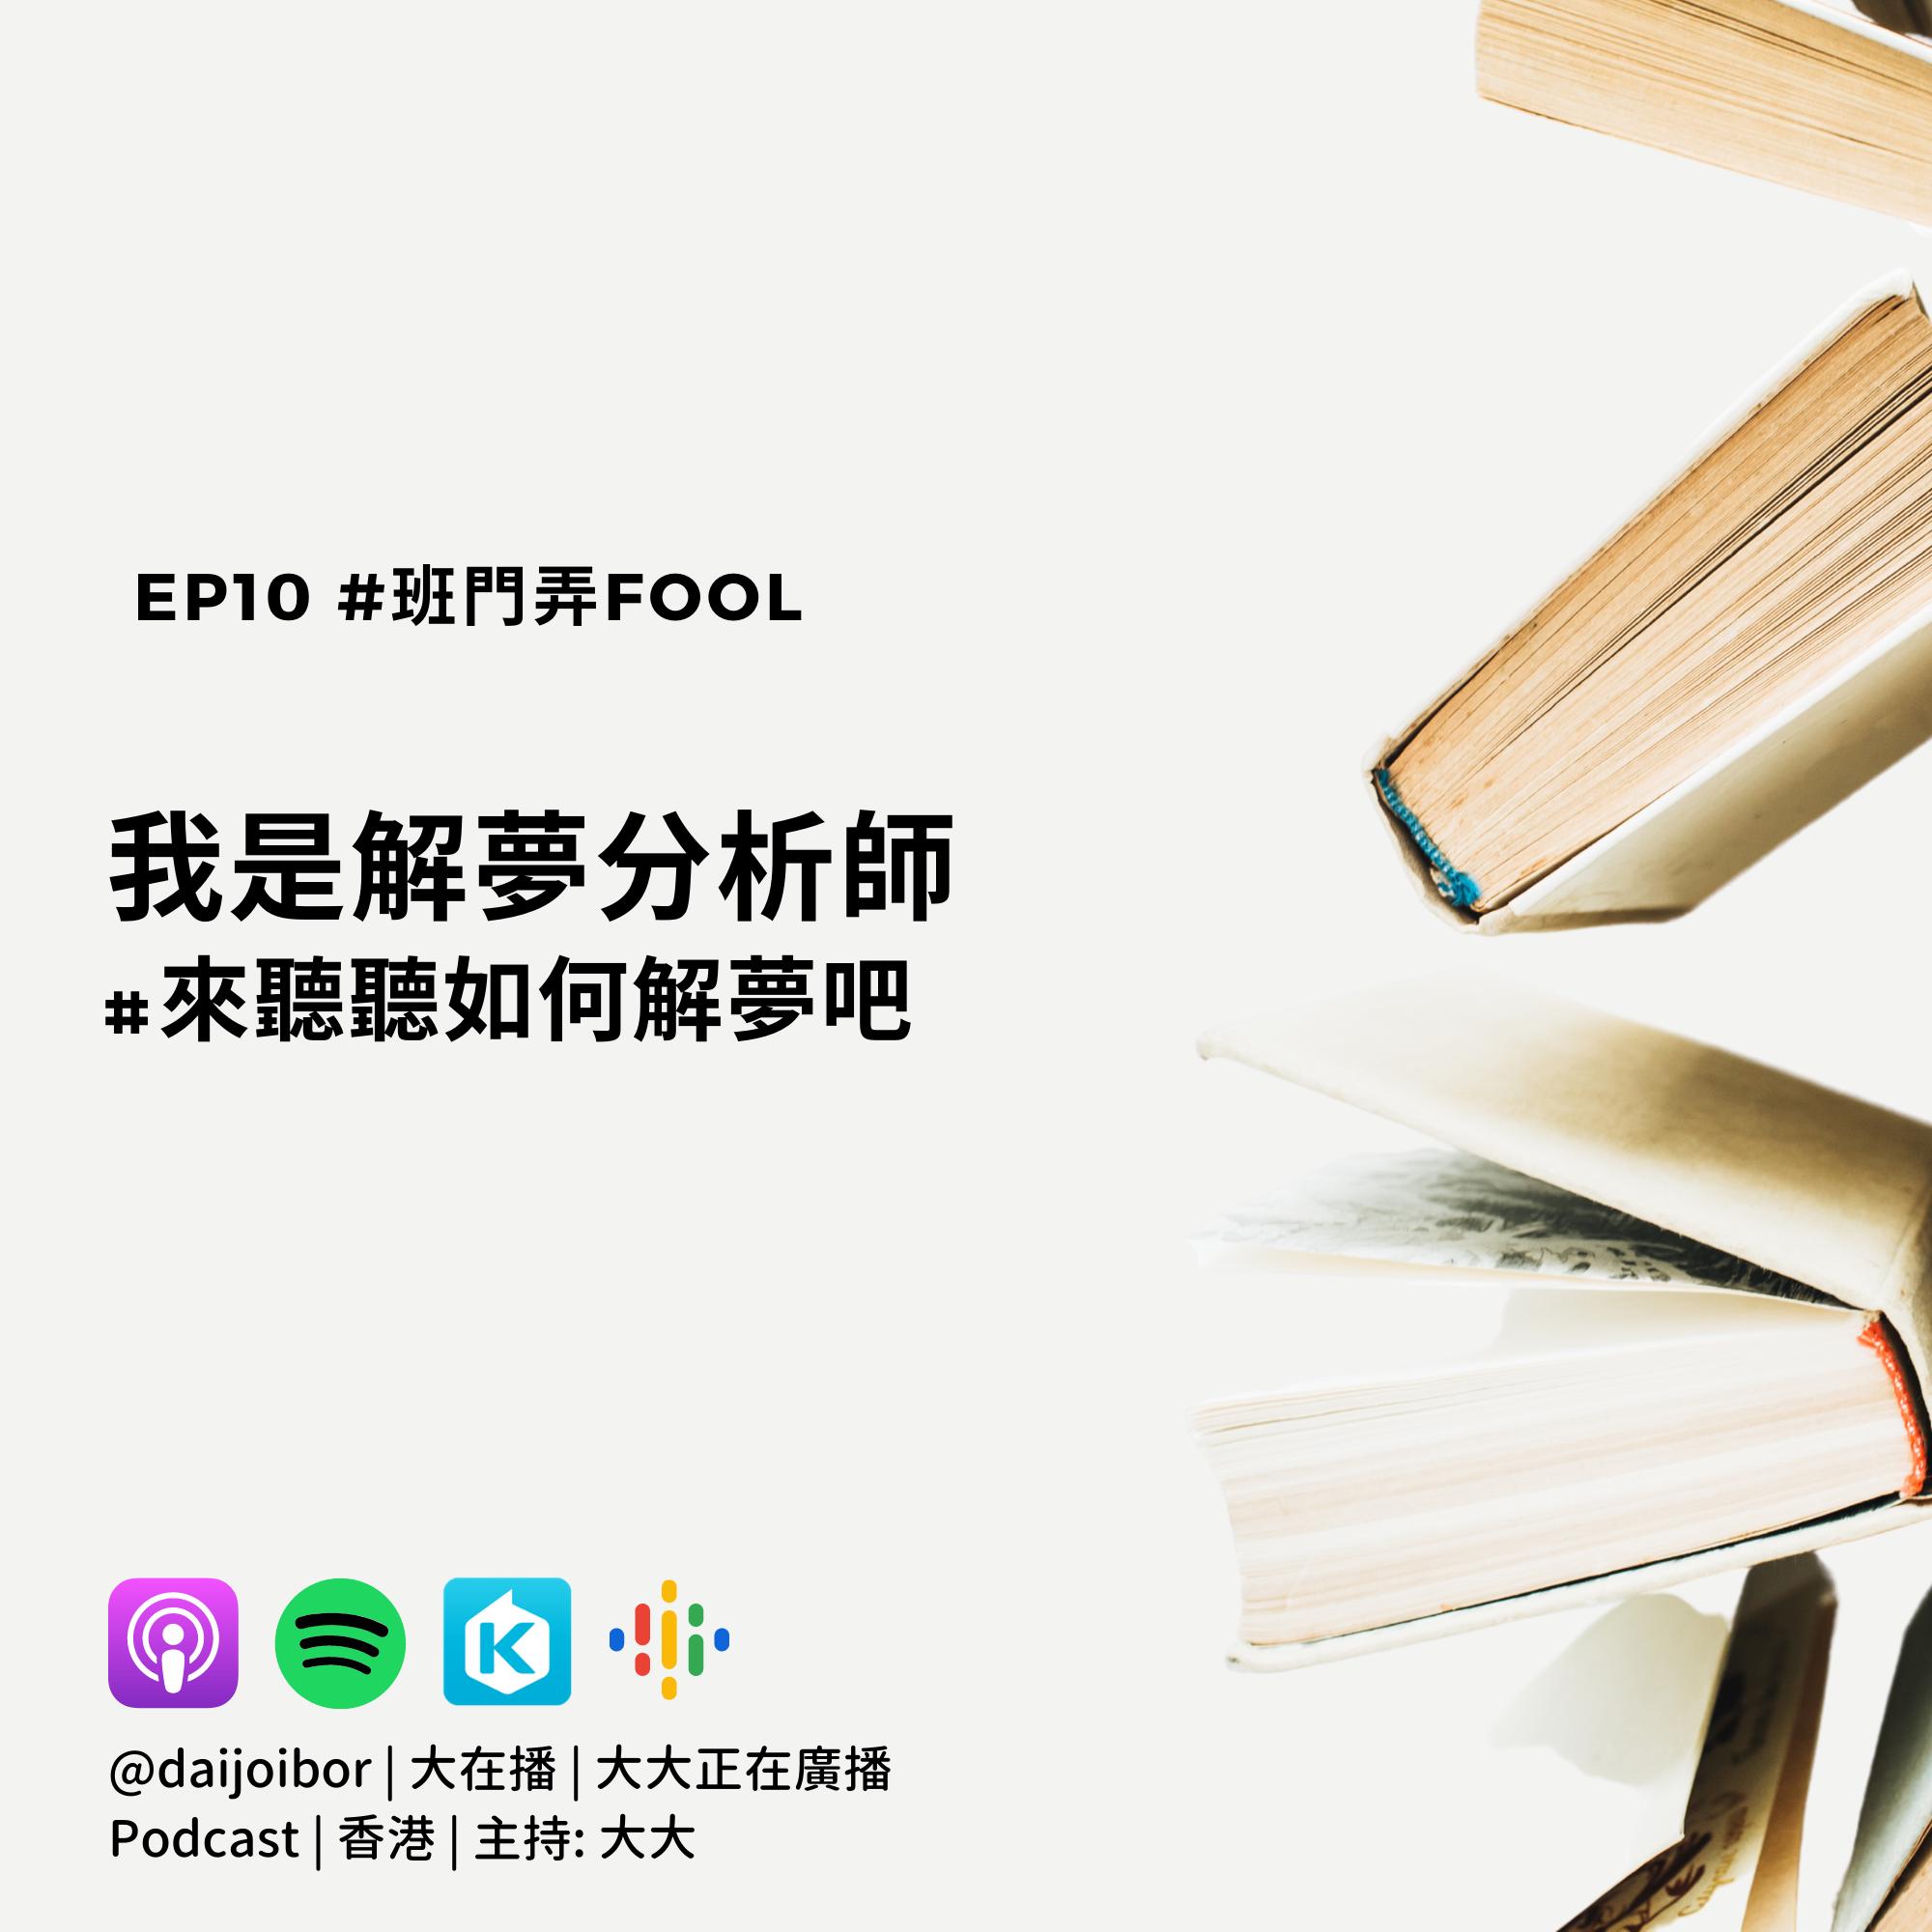 EP10【班門弄FOOL】我是解夢分析師